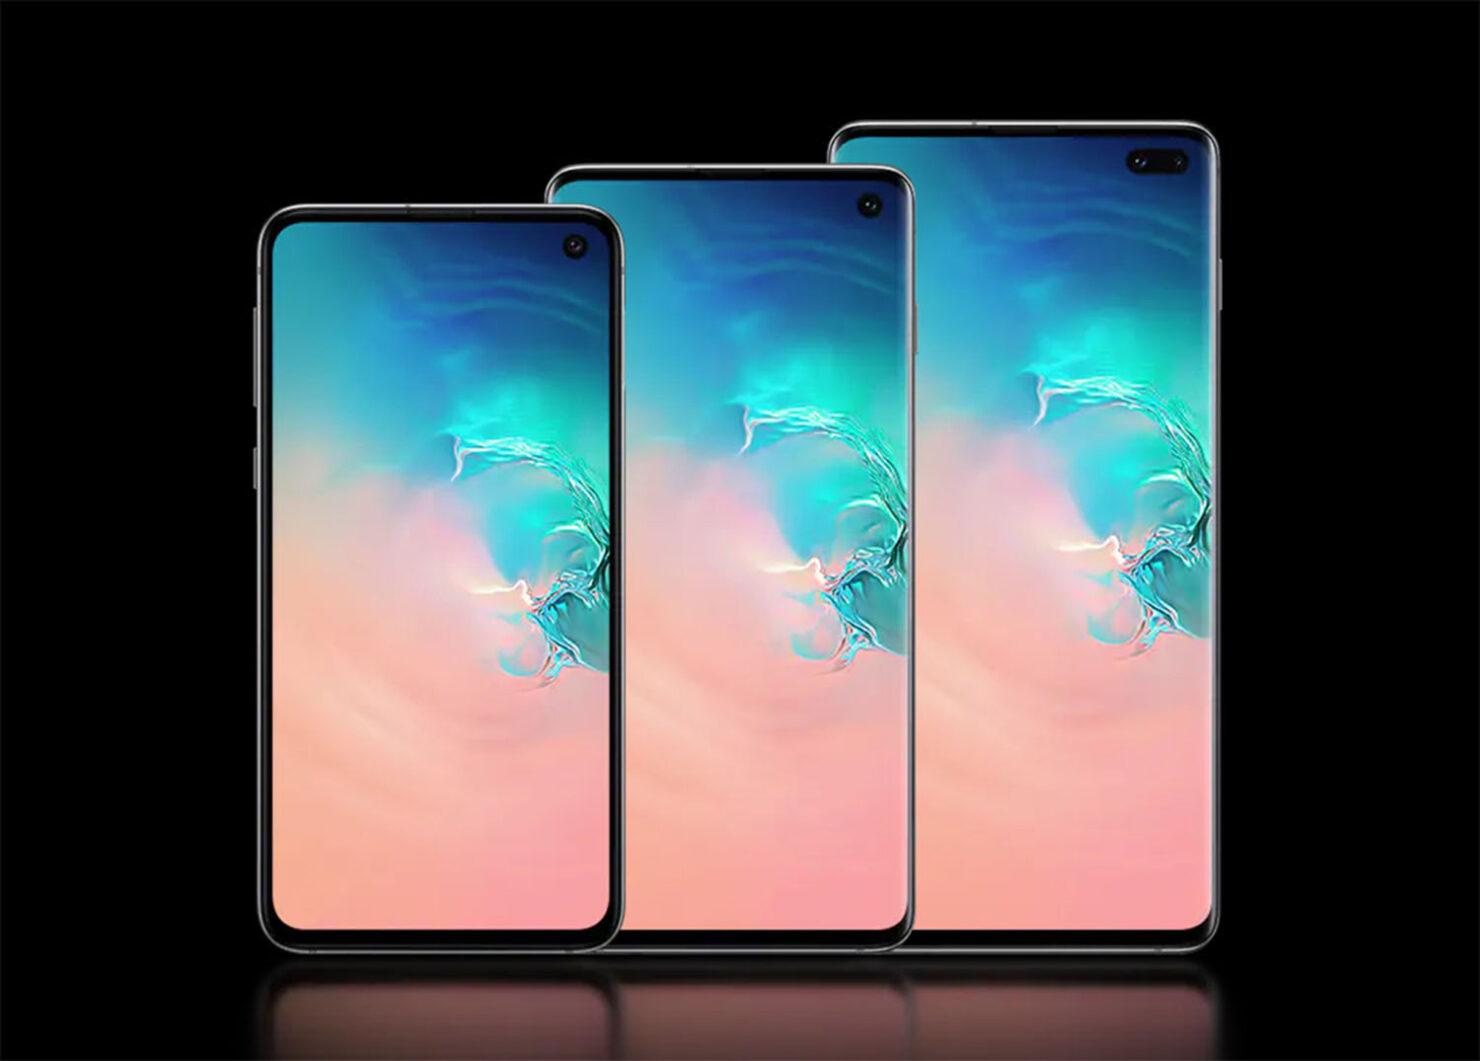 Samsung Galaxy S10 Galaxy Note 10 free buds Black Friday 2019 deal